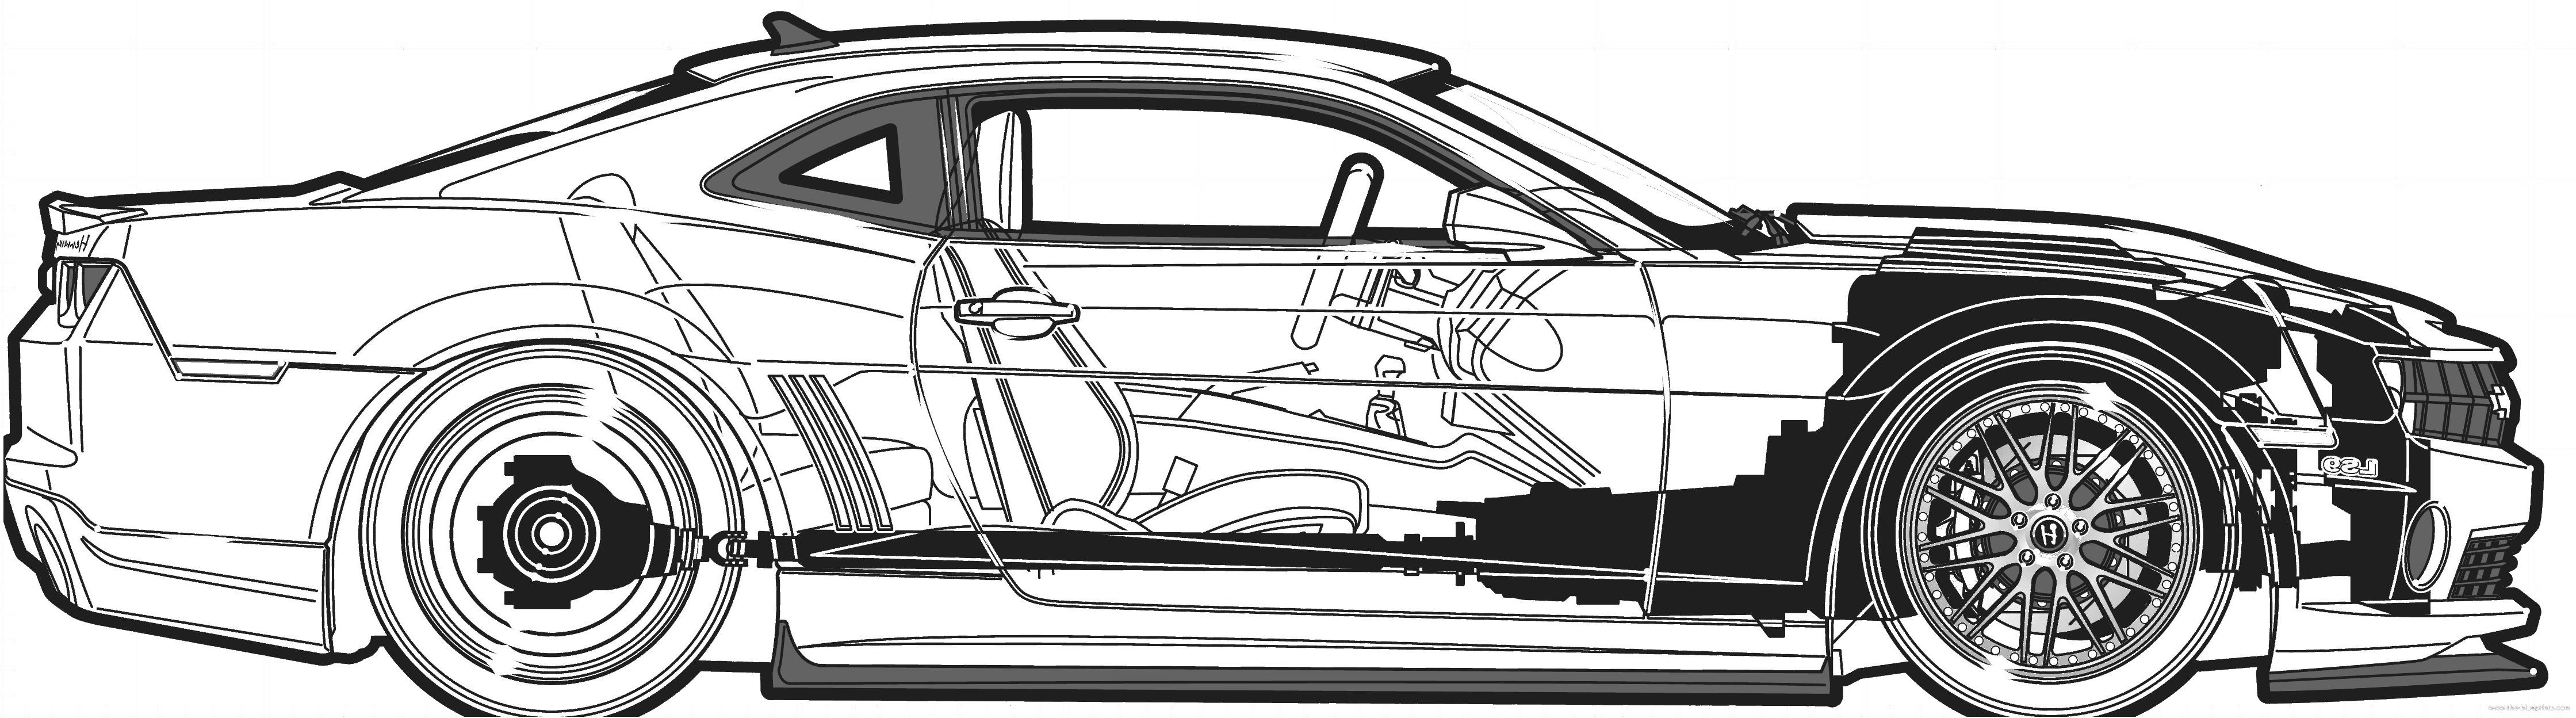 Car blueprints camaro malvernweather Images